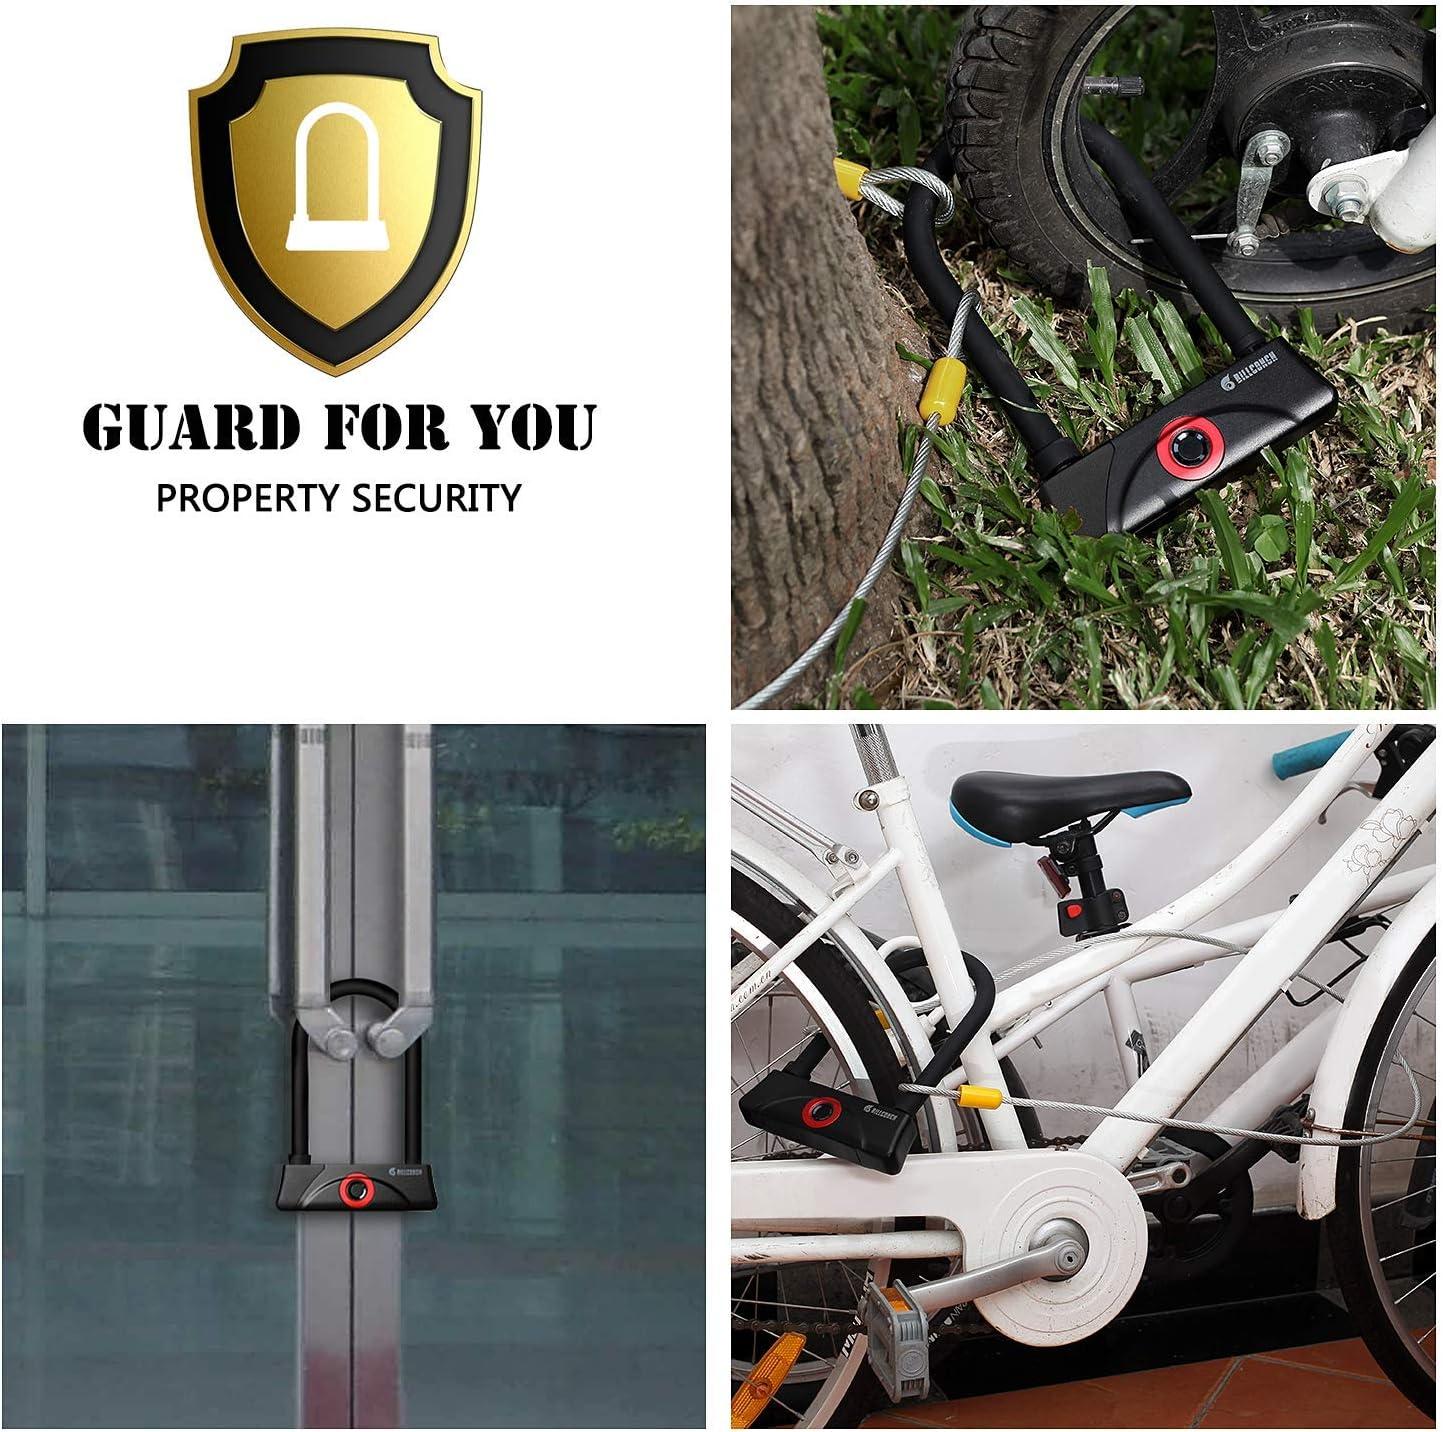 BILLCONCH Fingerprint Bike U Lock,Waterproof Bike U-Lock Gate Lock with Cable Duty U-Lock For Road Bike Mountain Bike Electric Bike Folding Bike USB Charging